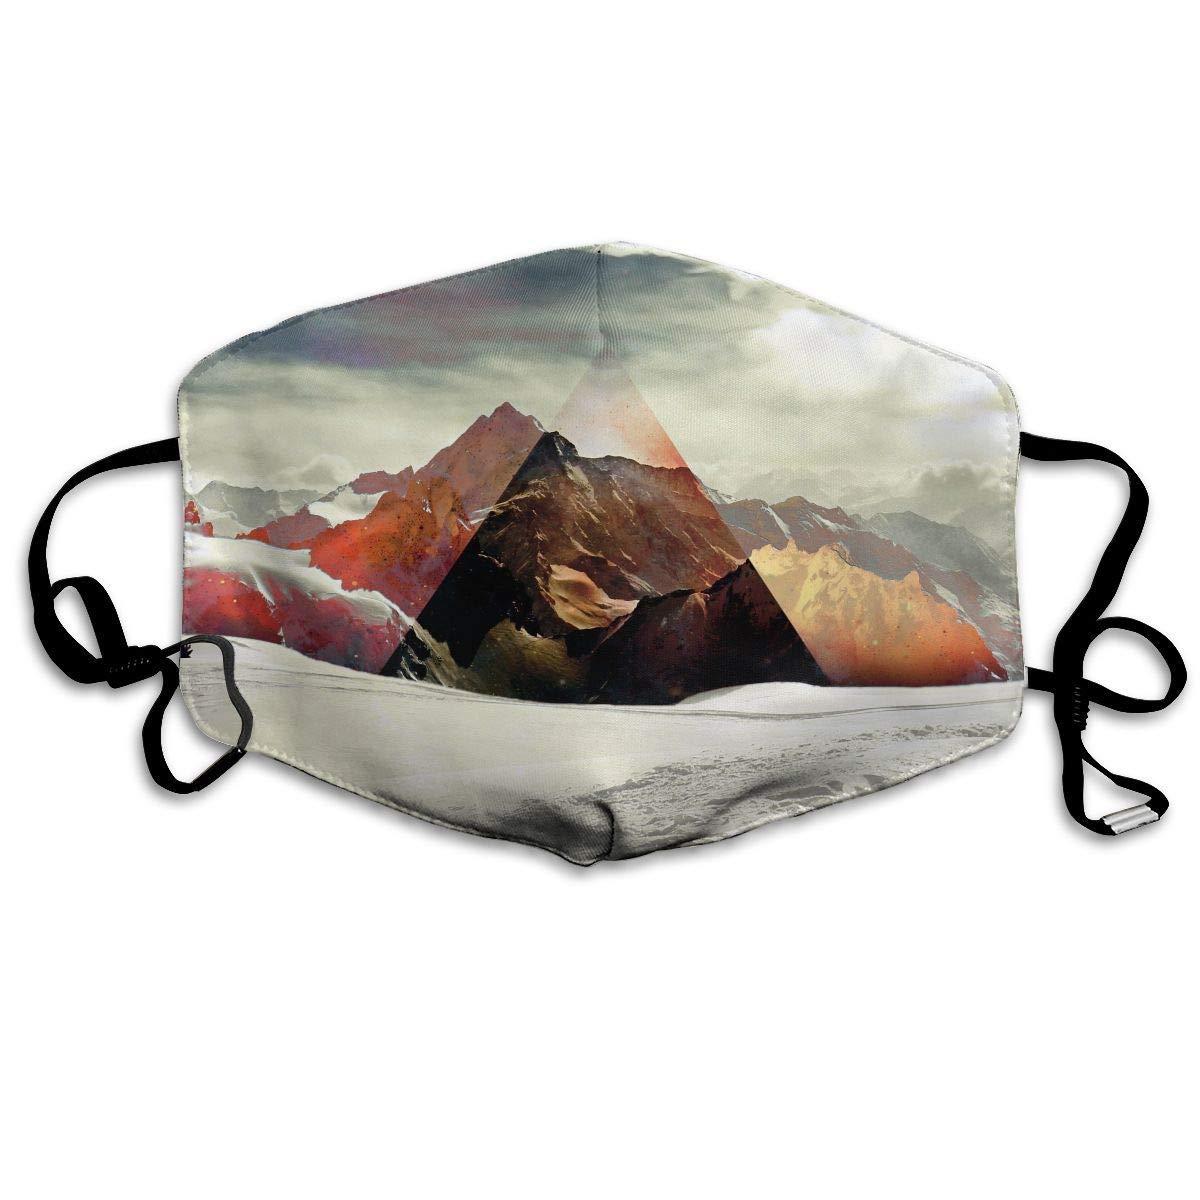 Daawqee Máscara de Boca, Antipolvo Cubierta de Boca Abstract Mountain Triangle Priint Reusable Washable Earloop Máscara de Boca for Men Women